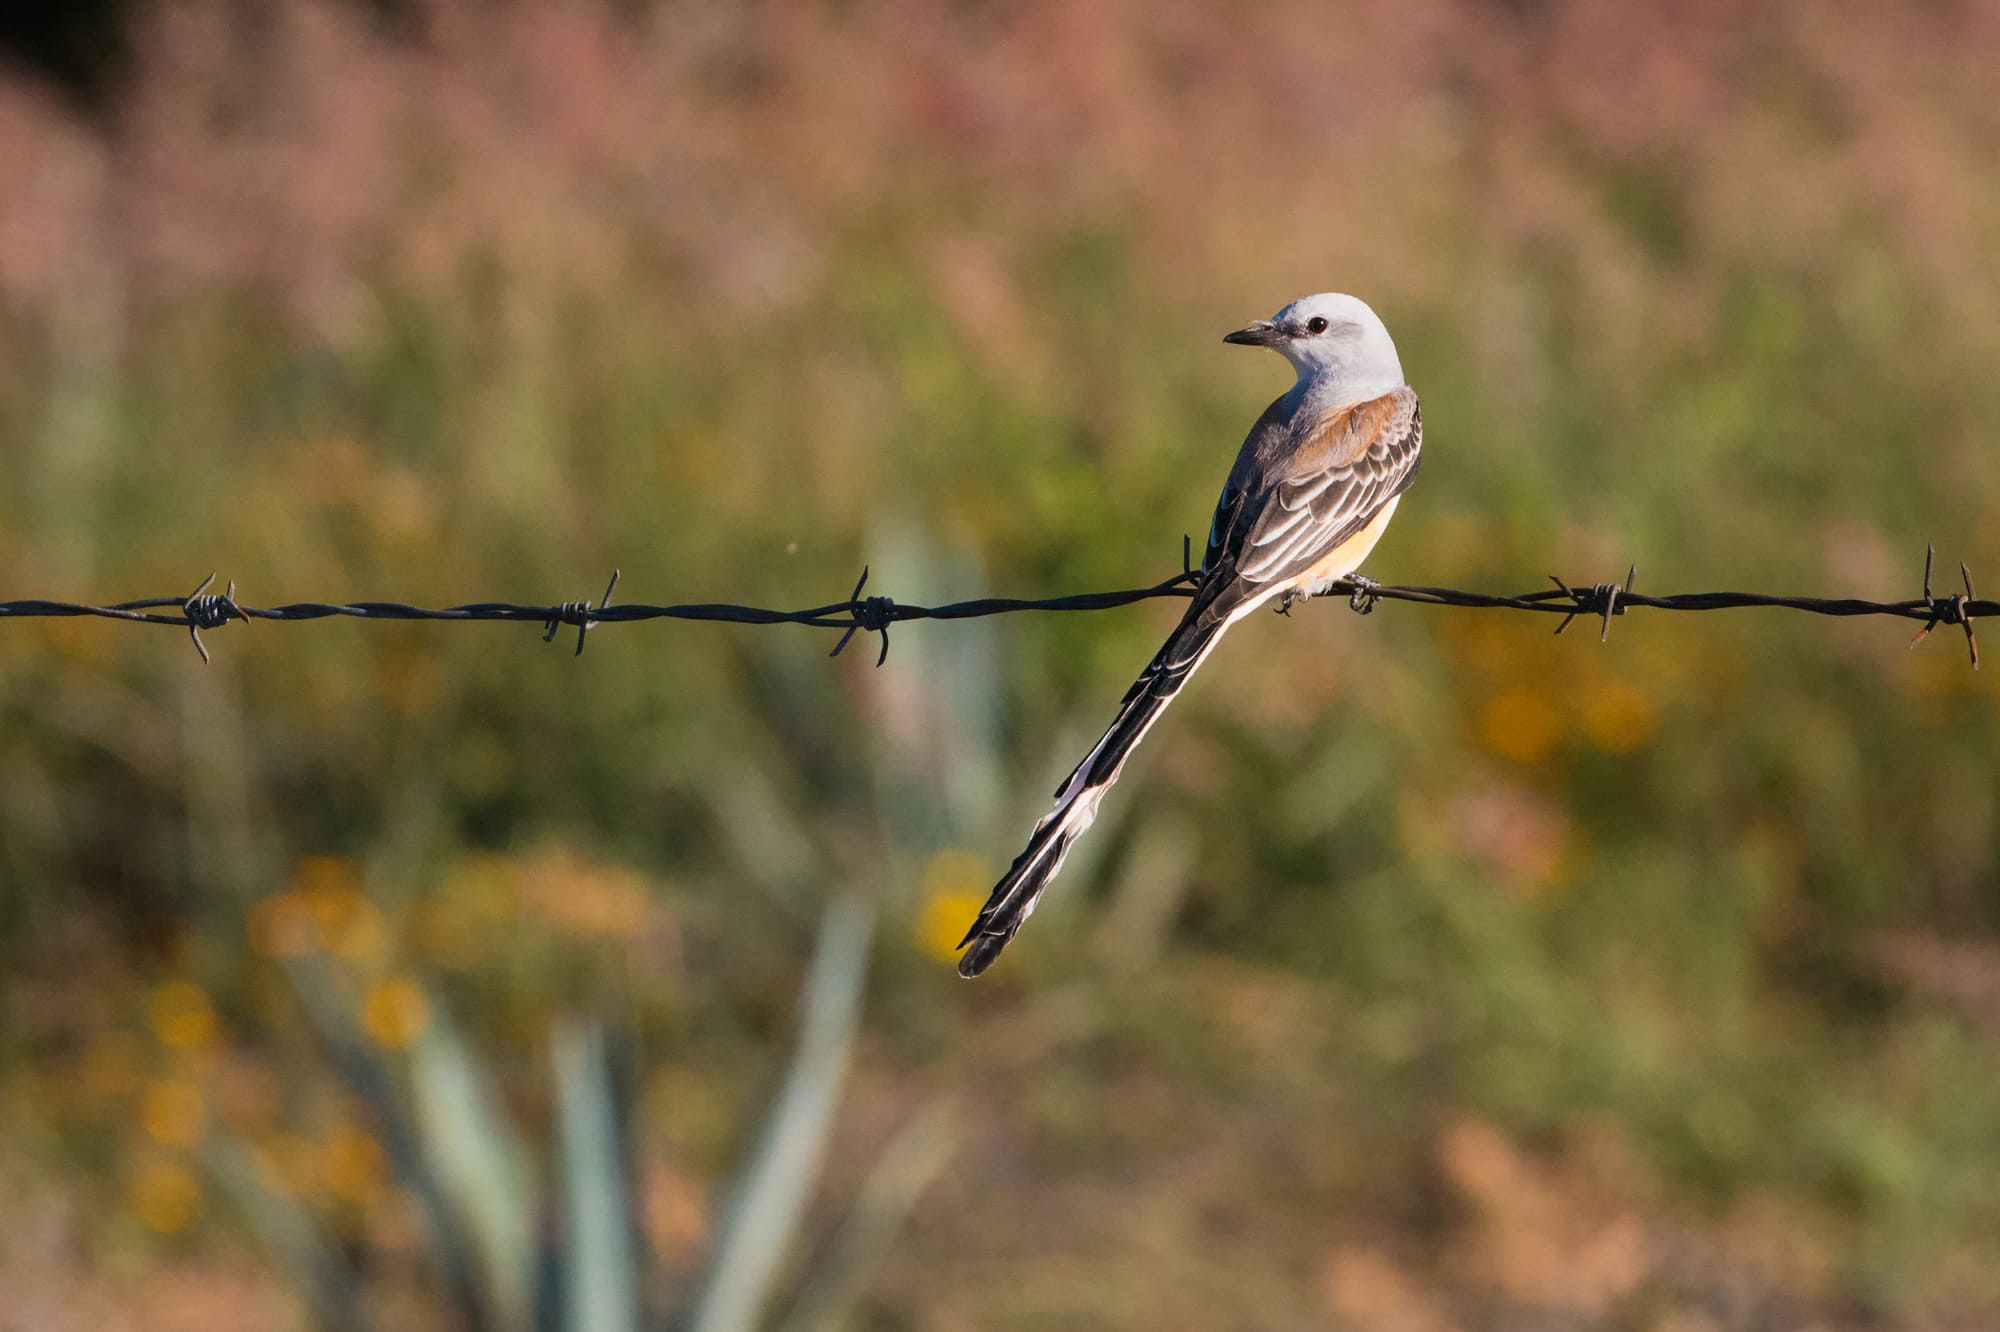 A Scissor-tailed Flycatcher